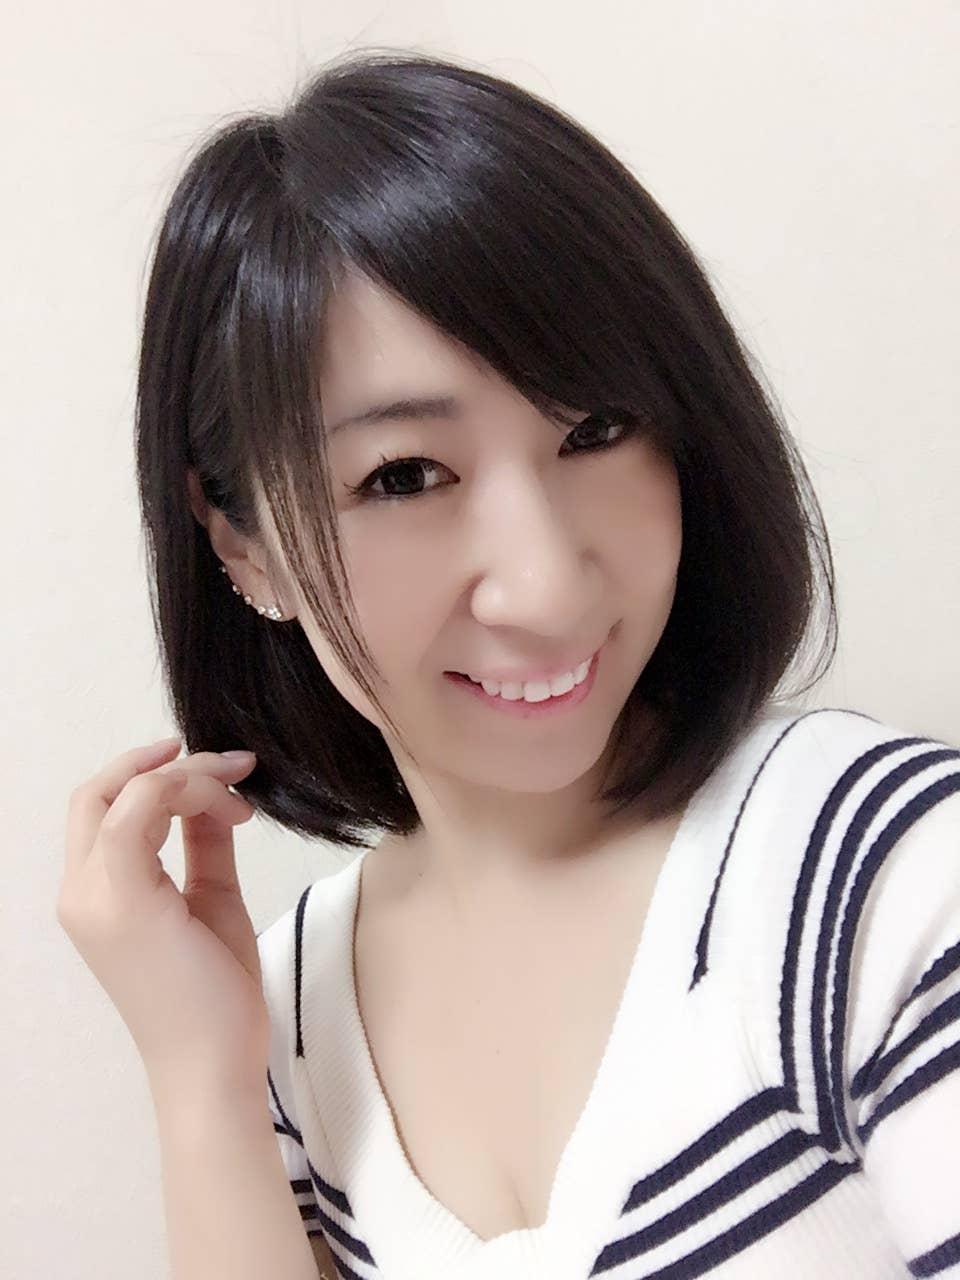 Asami Imura